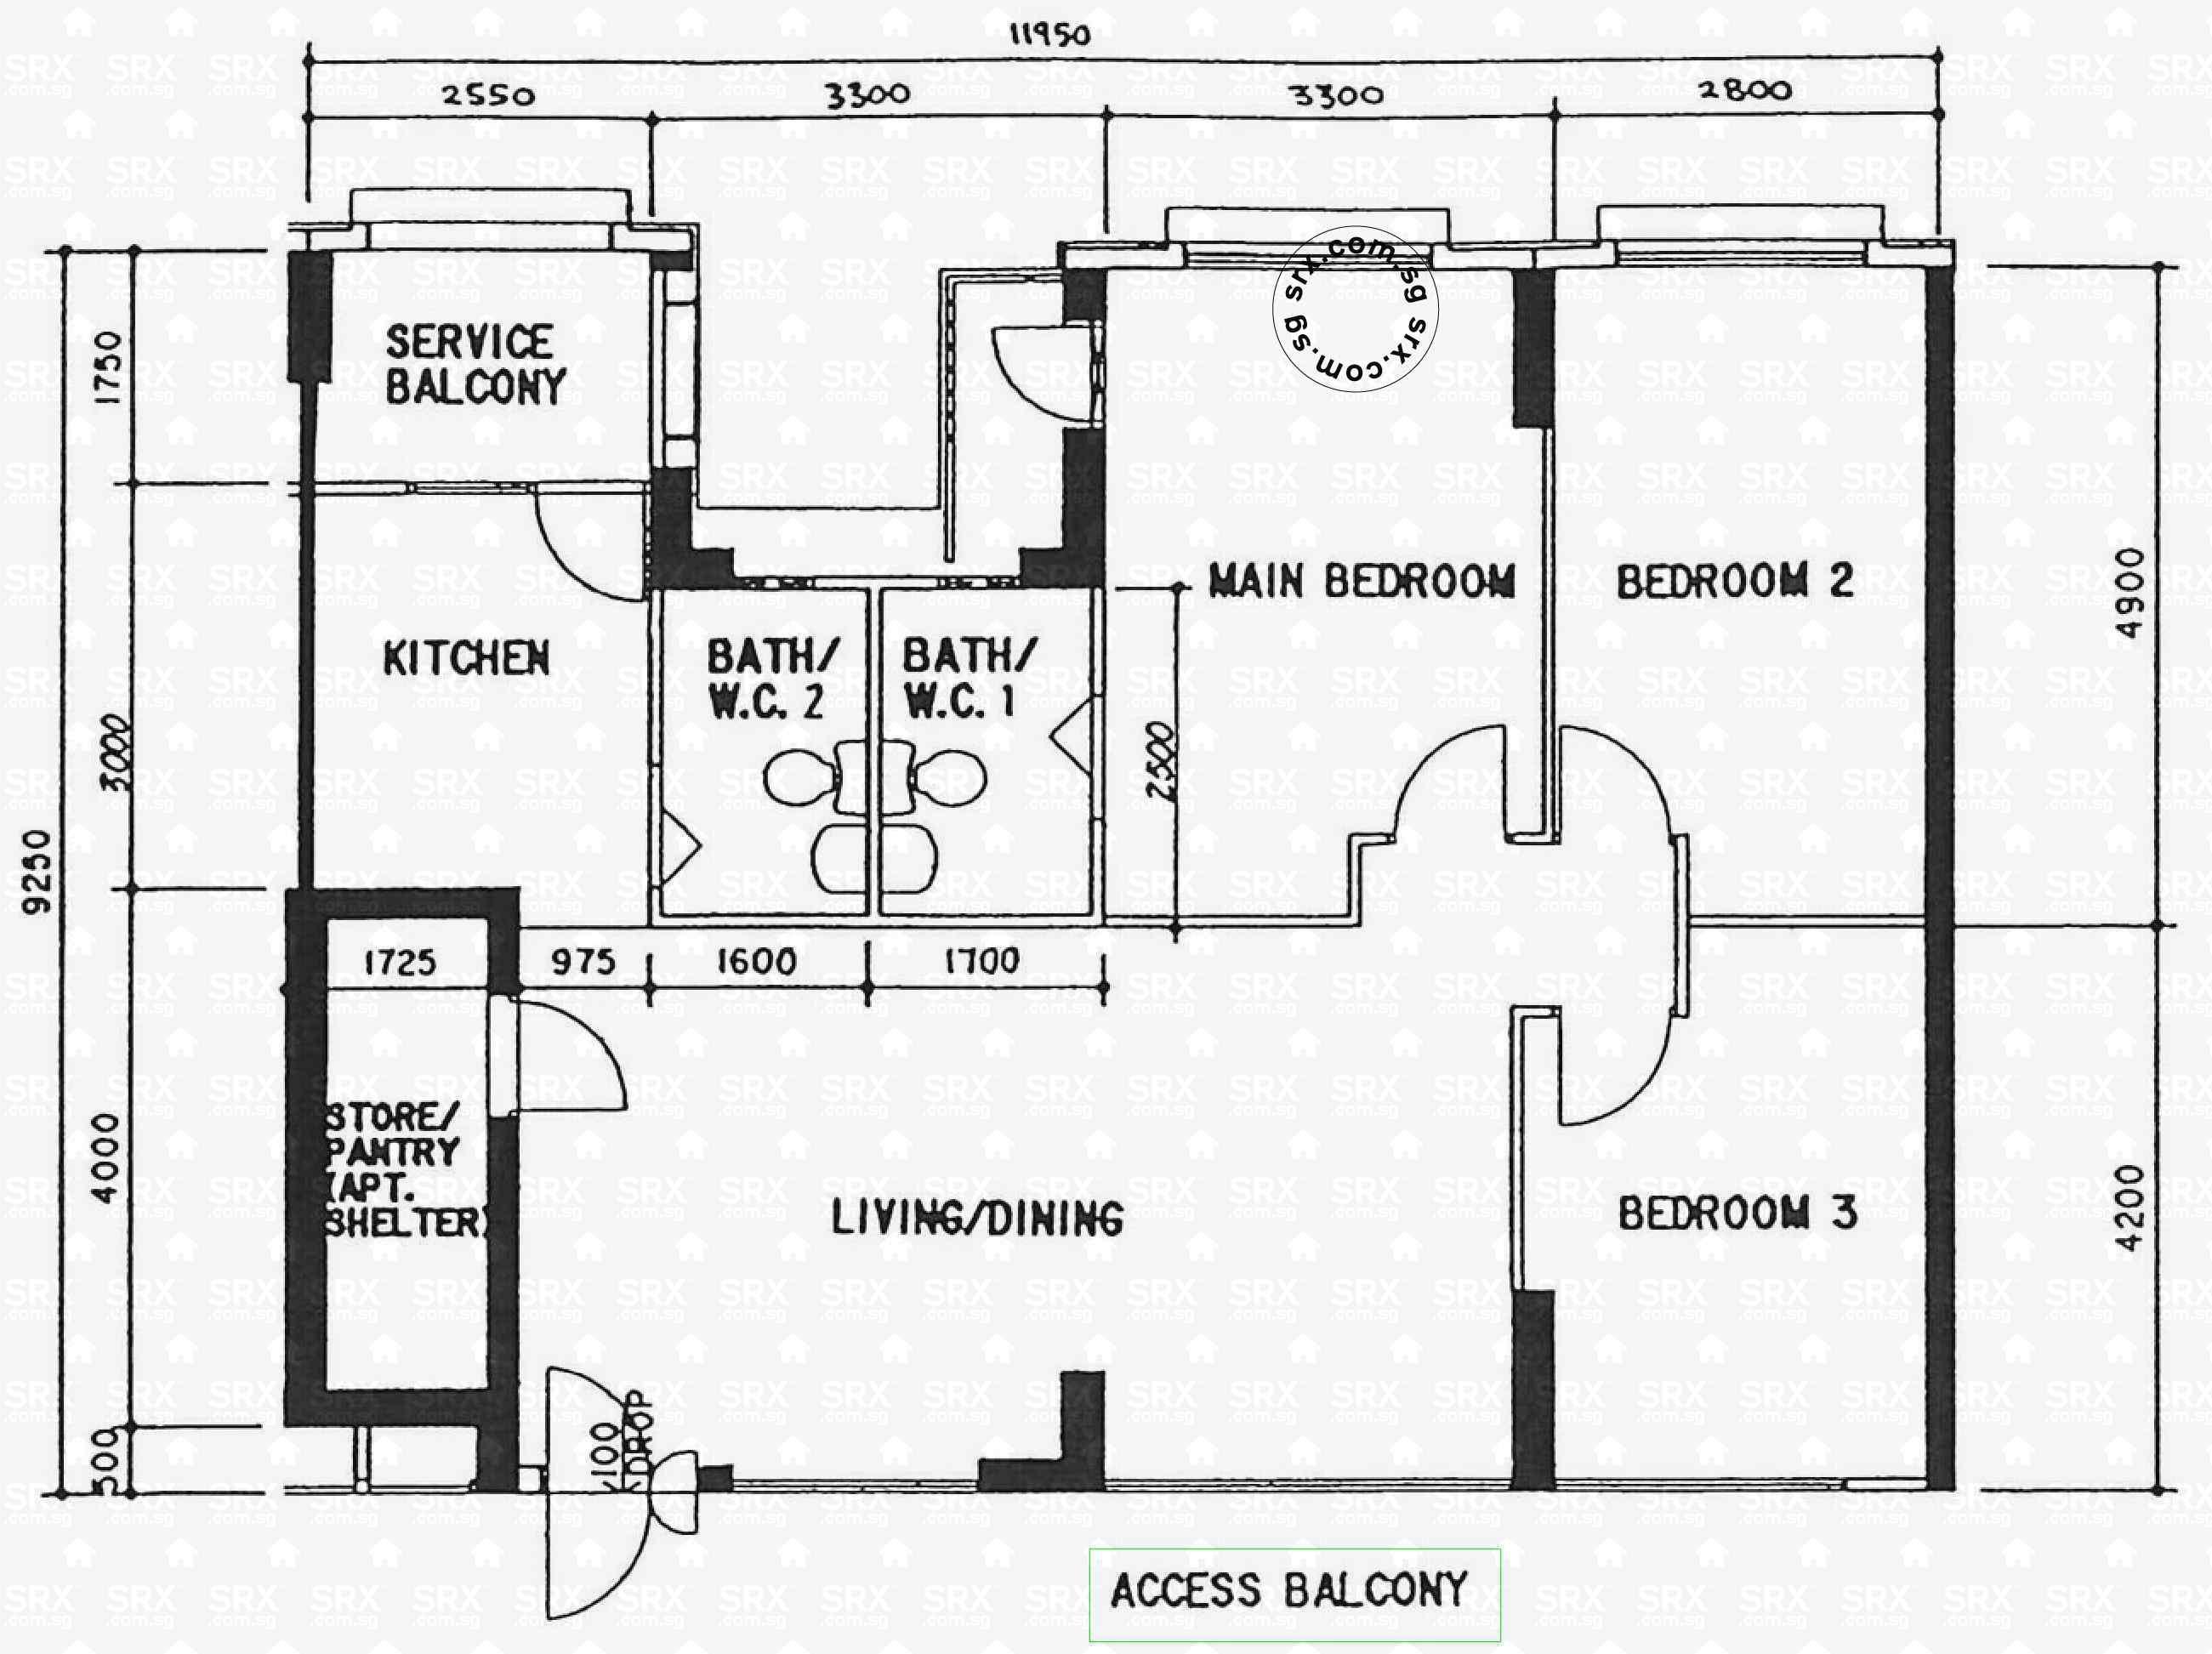 Sembawang crescent hdb details srx property for 1077 marinaside crescent floor plan